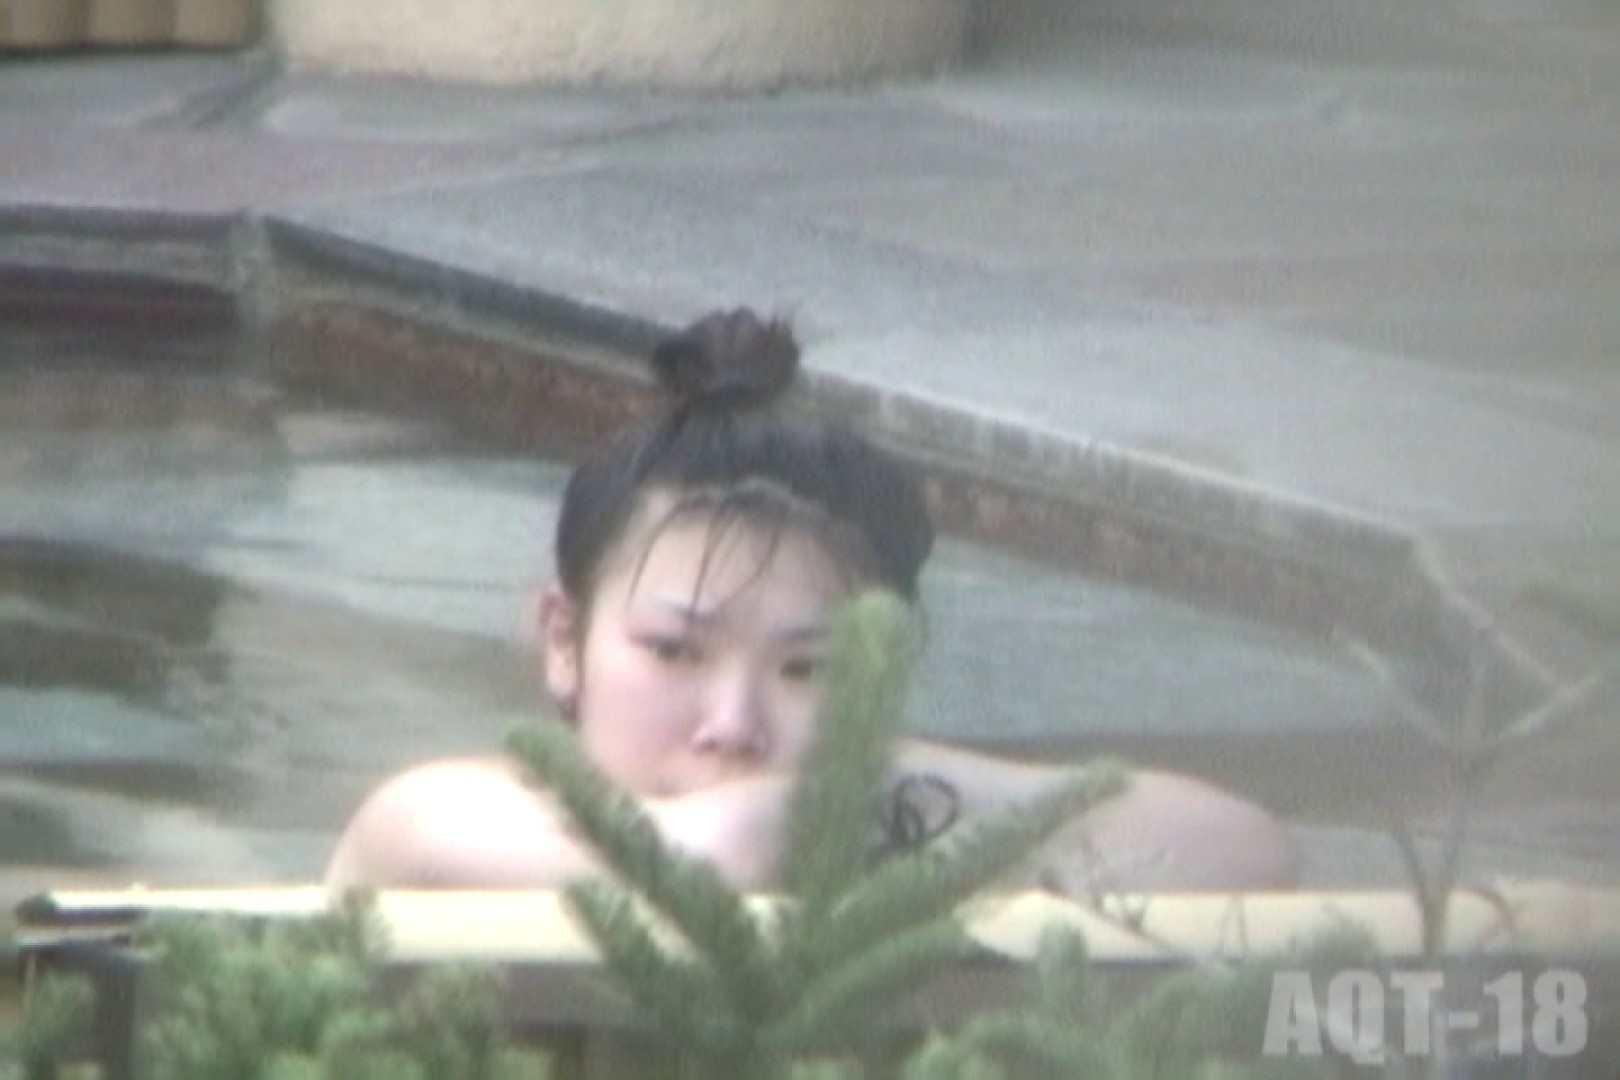 Aquaな露天風呂Vol.855 露天 | OLセックス  67画像 52